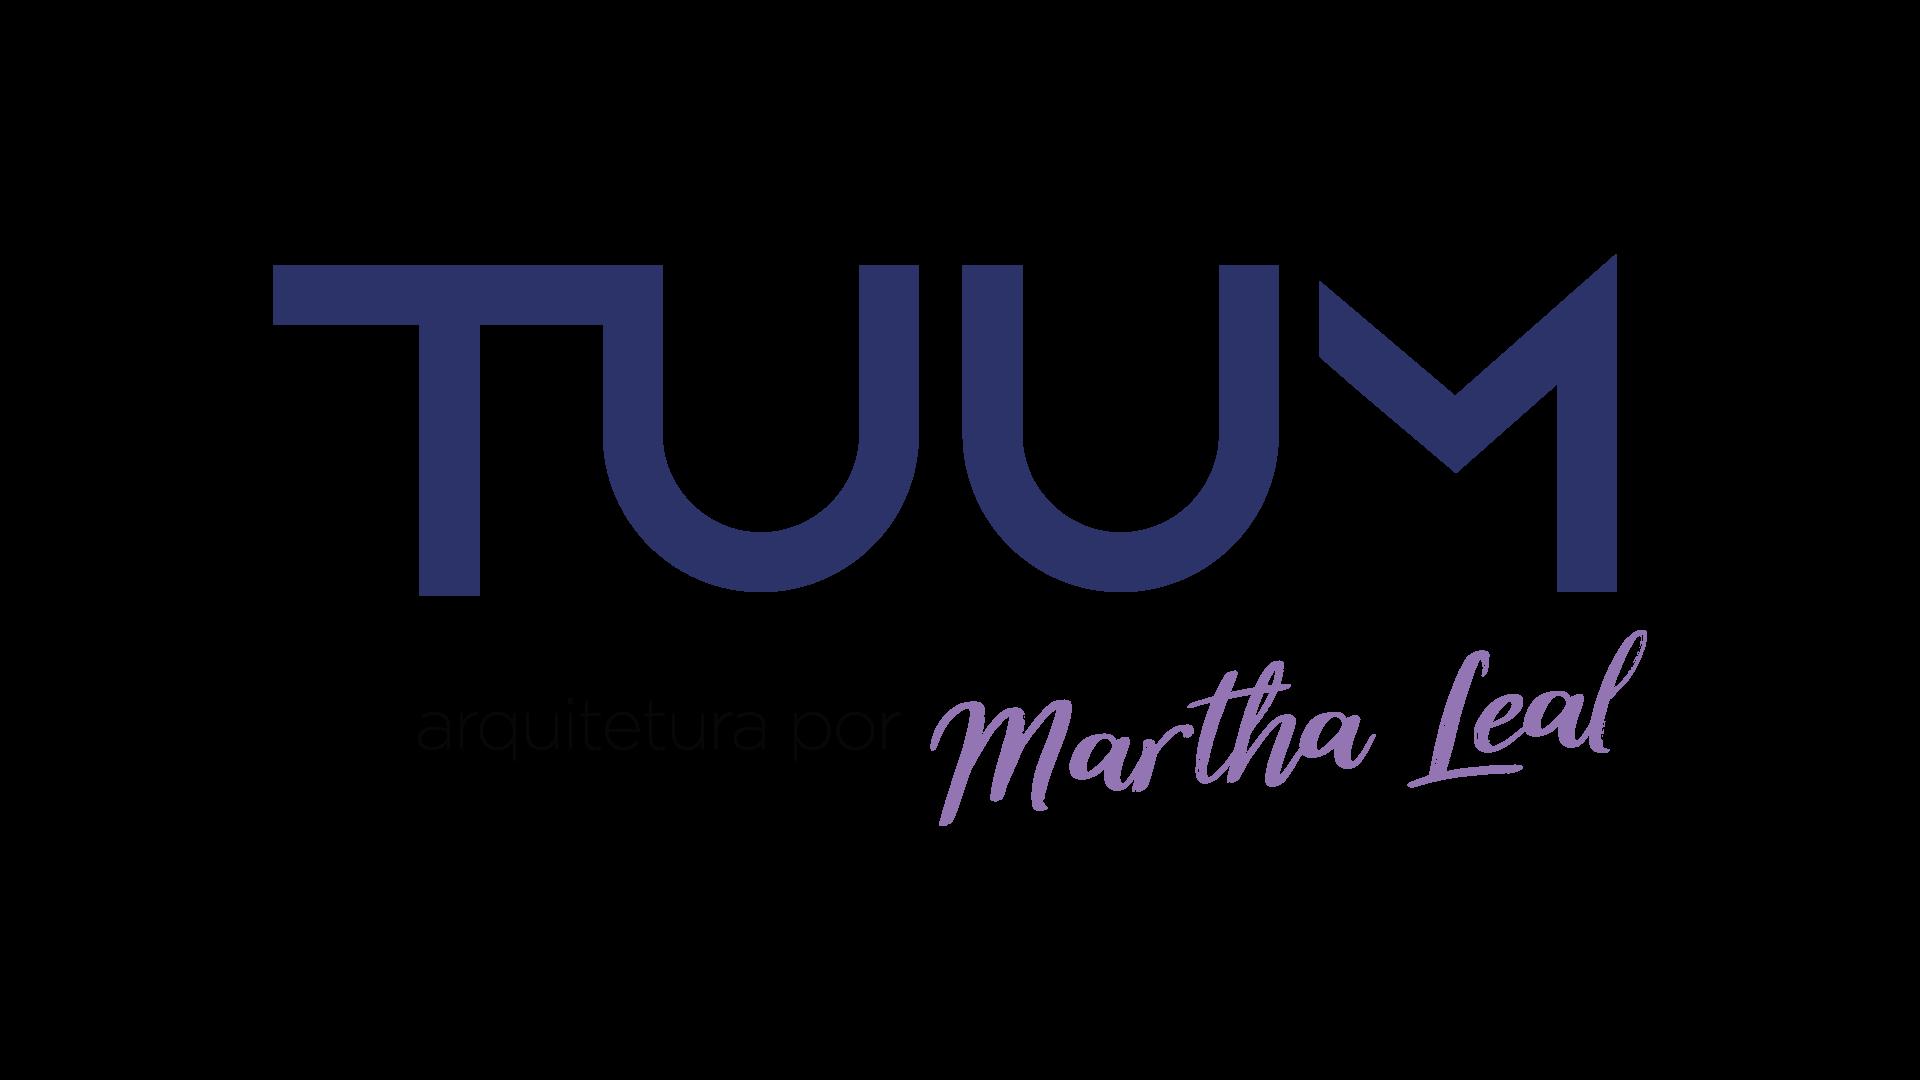 Marca_TUUM_Cor